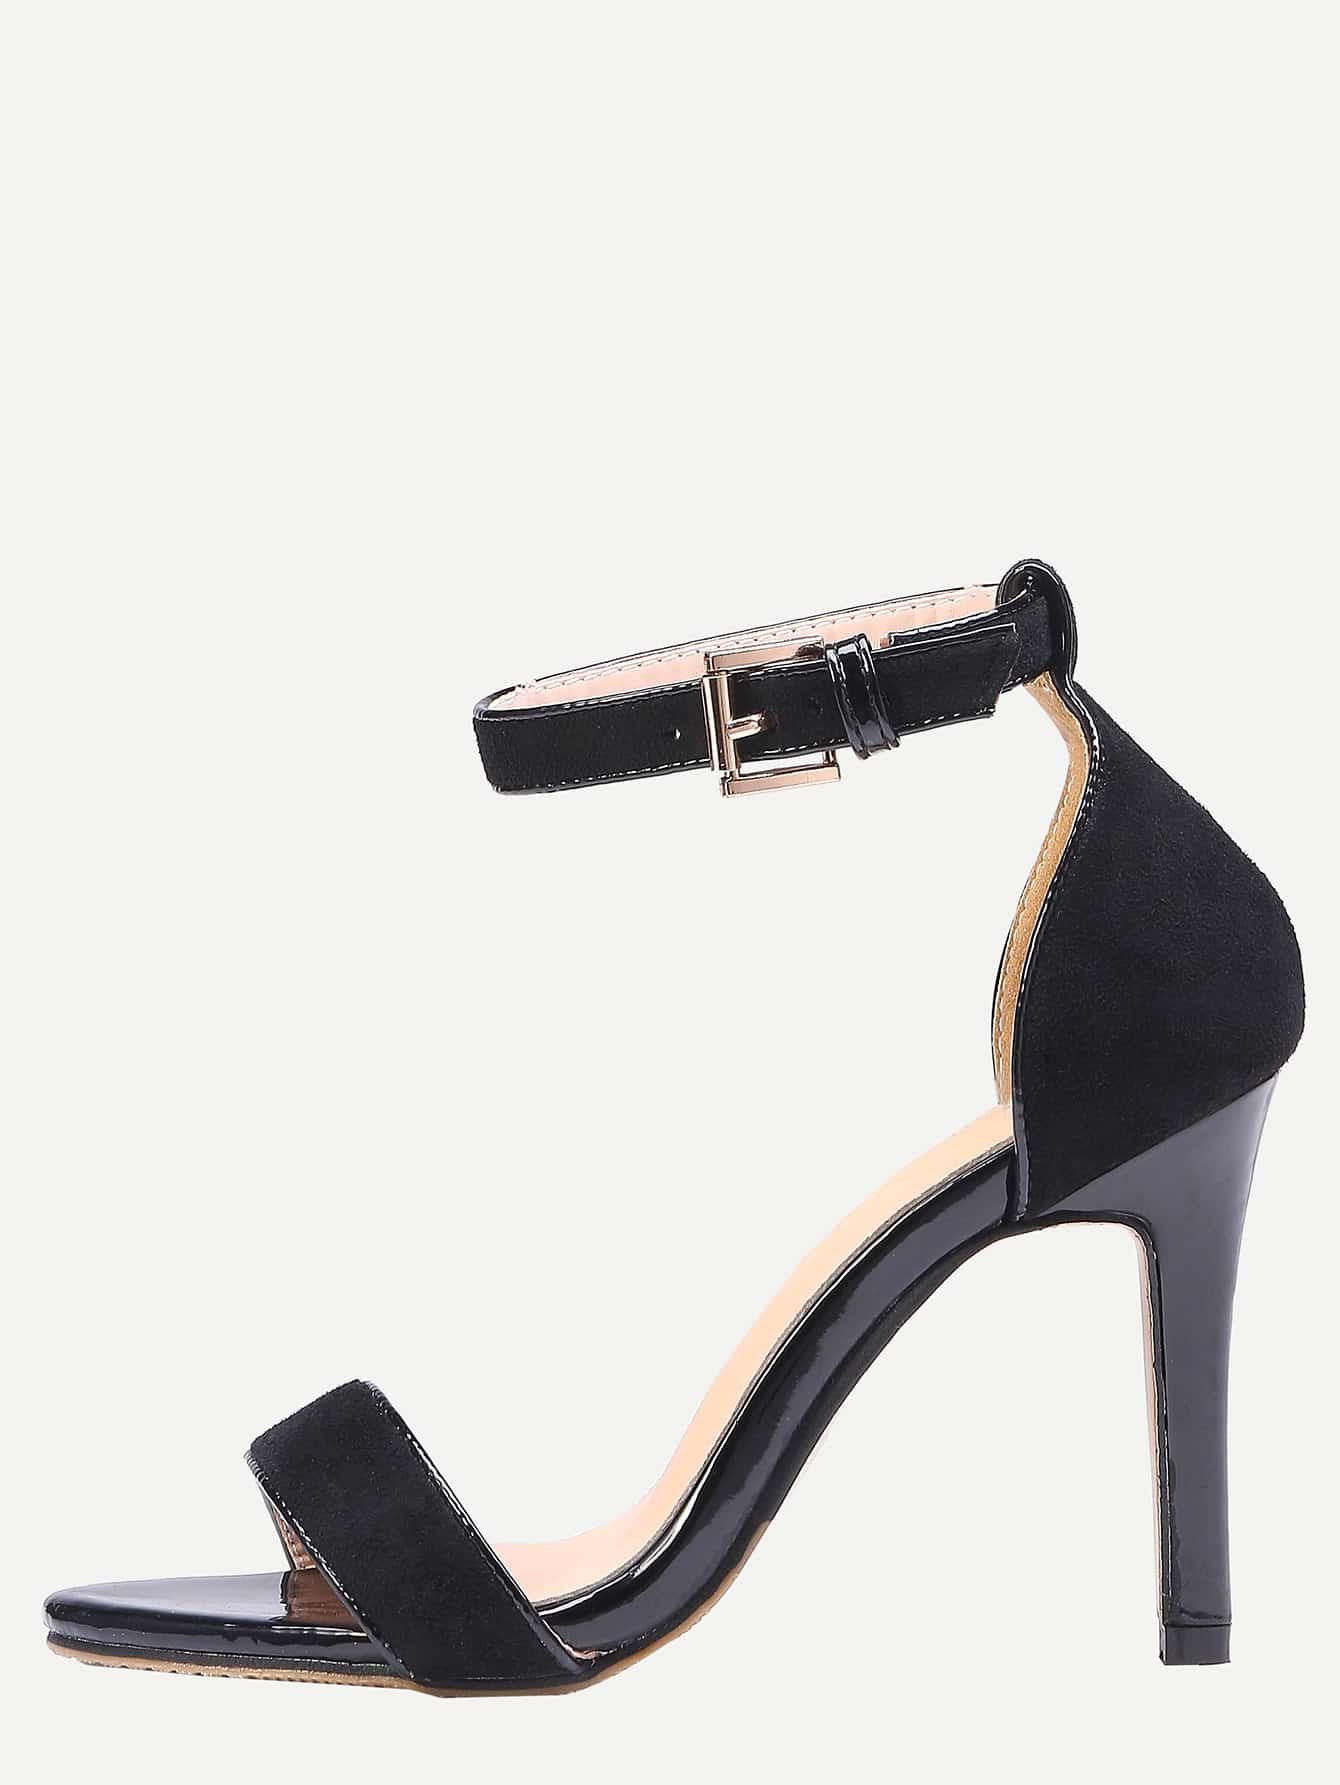 Black Ankle Strap Stiletto Sandals RSHO15121105